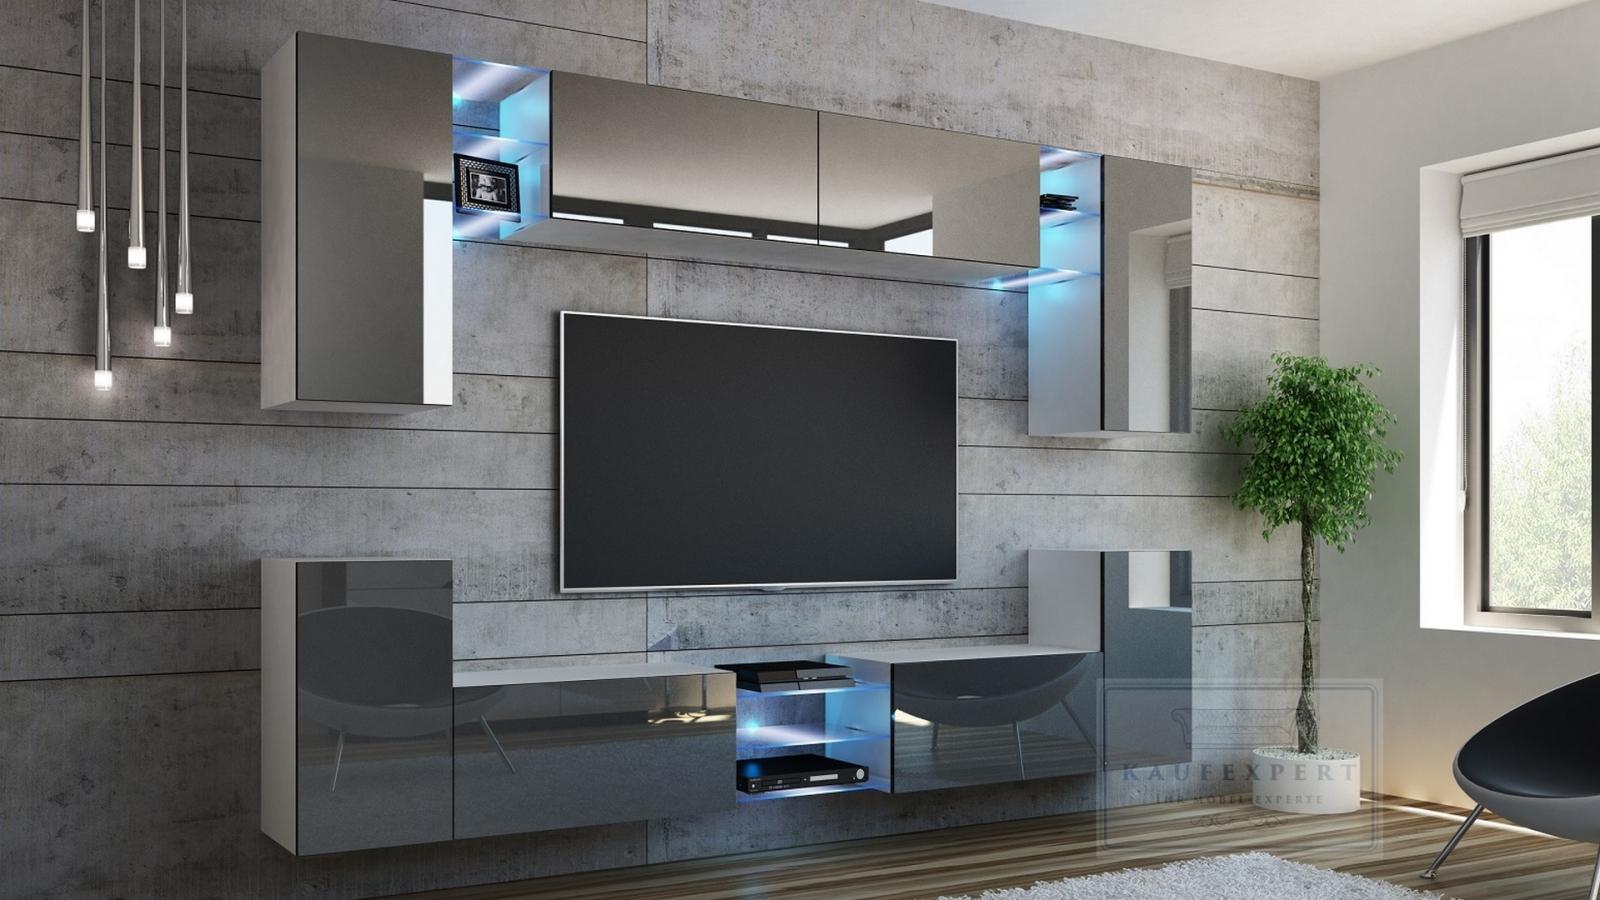 kaufexpert kommode shine sideboard 120 cm grau hochglanz wei led beleuchtung modern design tv. Black Bedroom Furniture Sets. Home Design Ideas